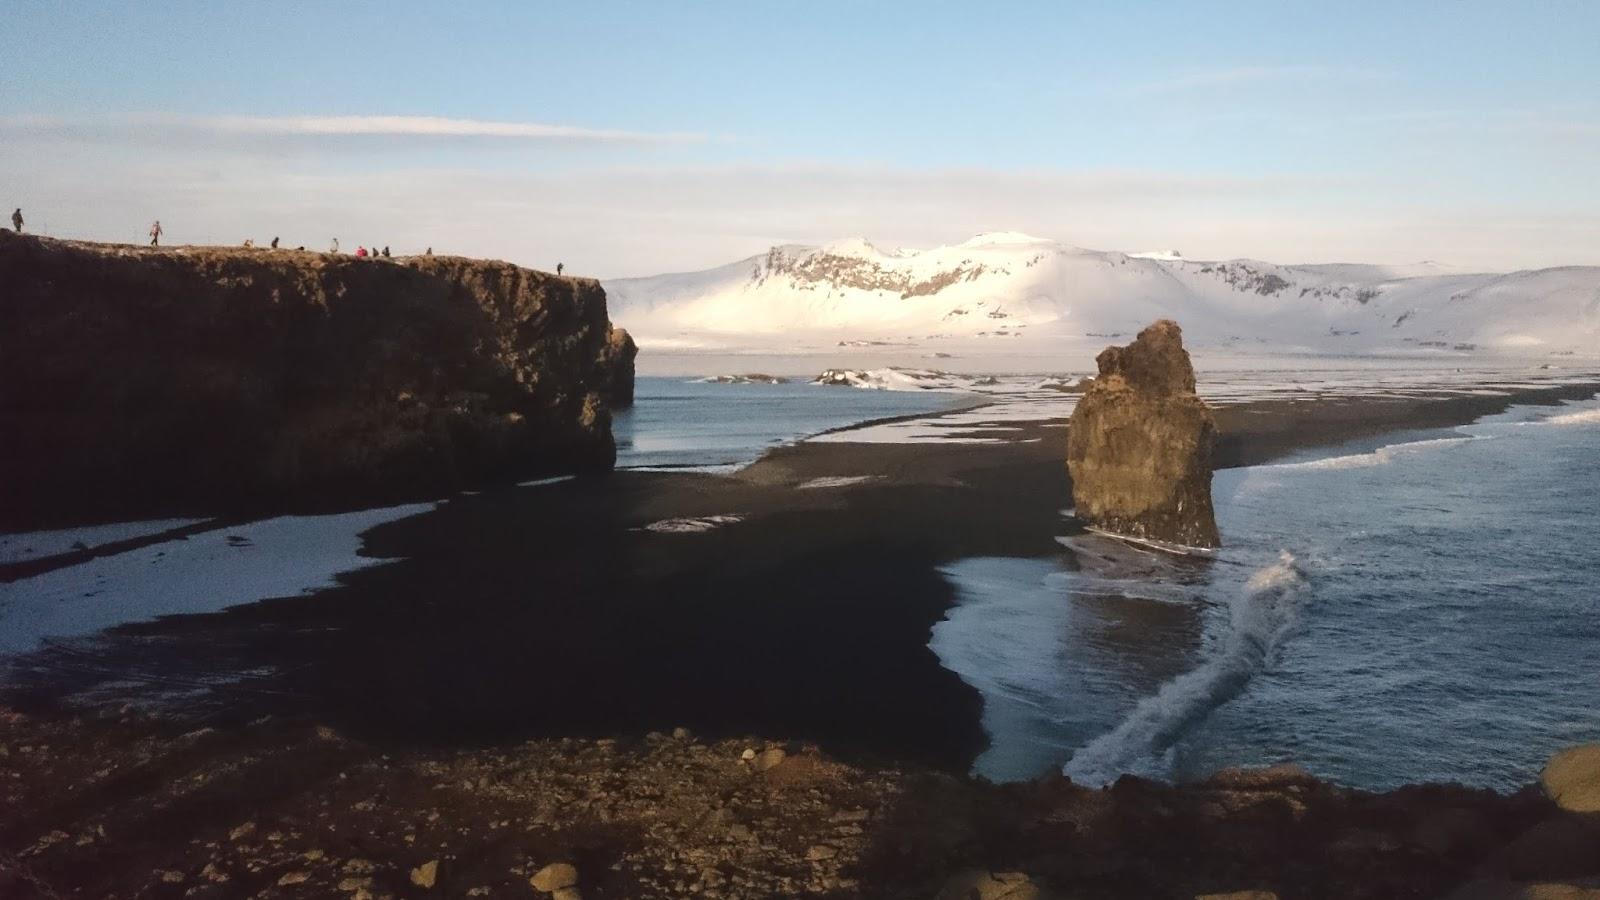 widok z Dyrholaey, Dyrholaey, cypel Dyrholaey, wybrzeże Islandii, islandzka plaża